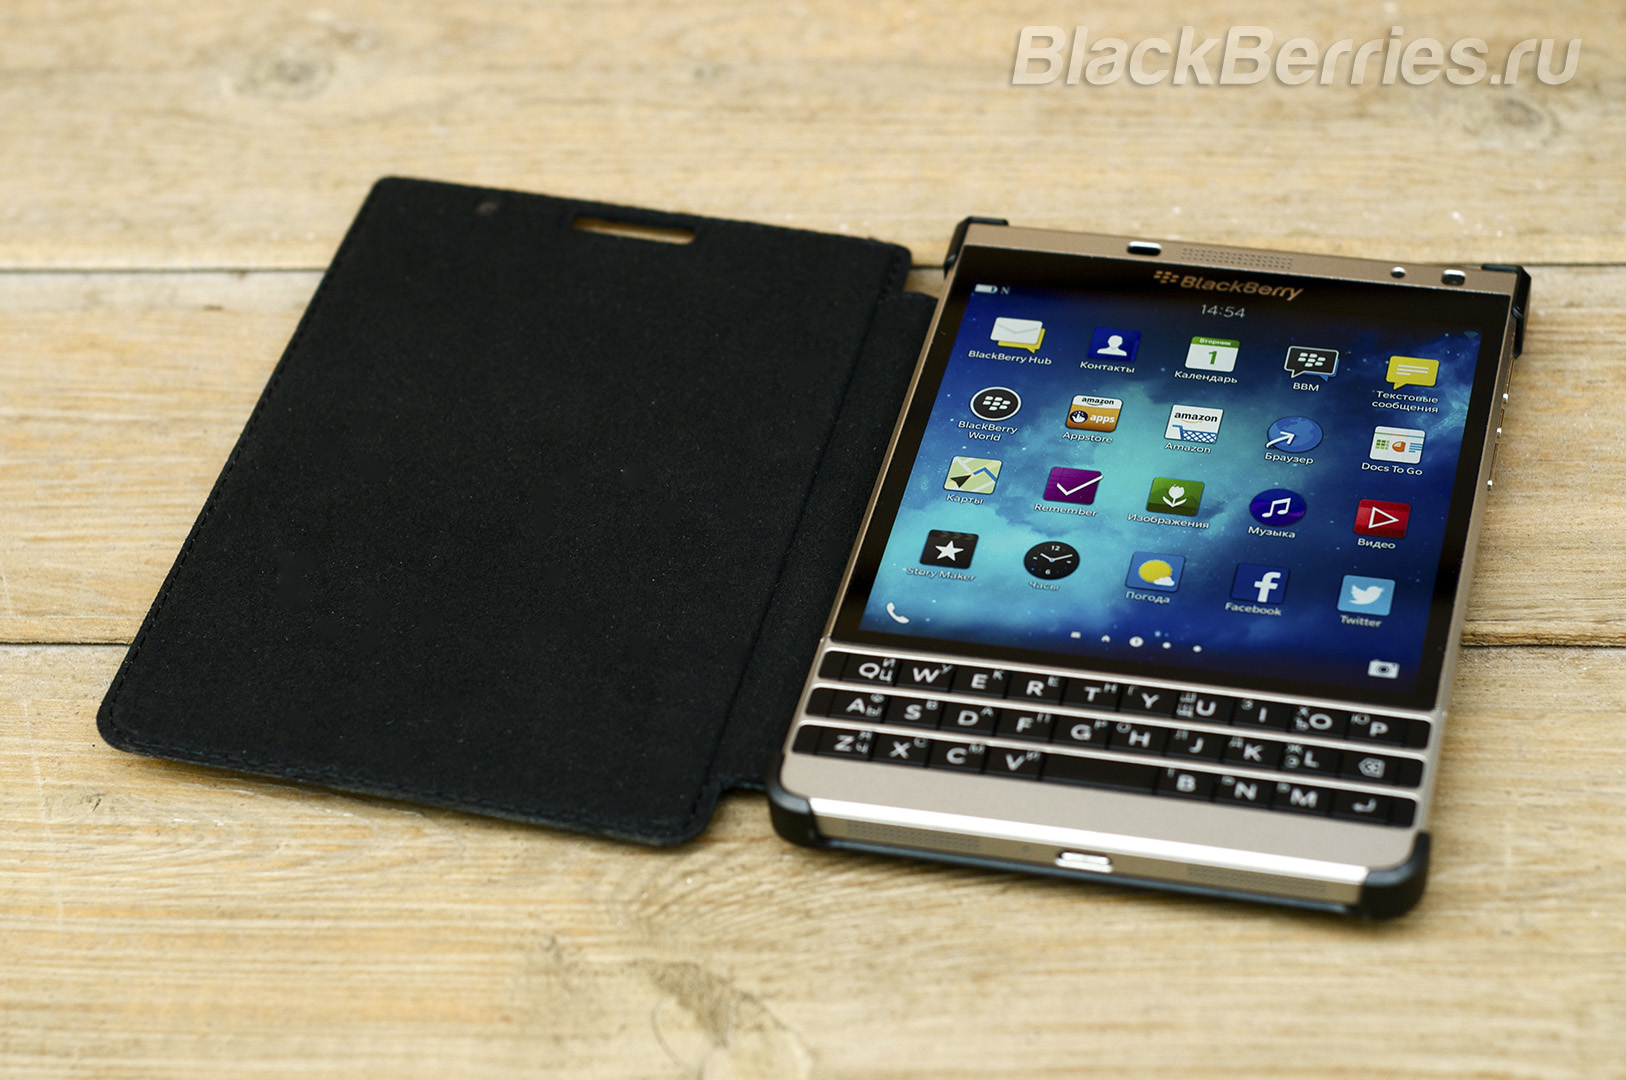 BlackBerry-Passport-Silver-Edition-Cases-12